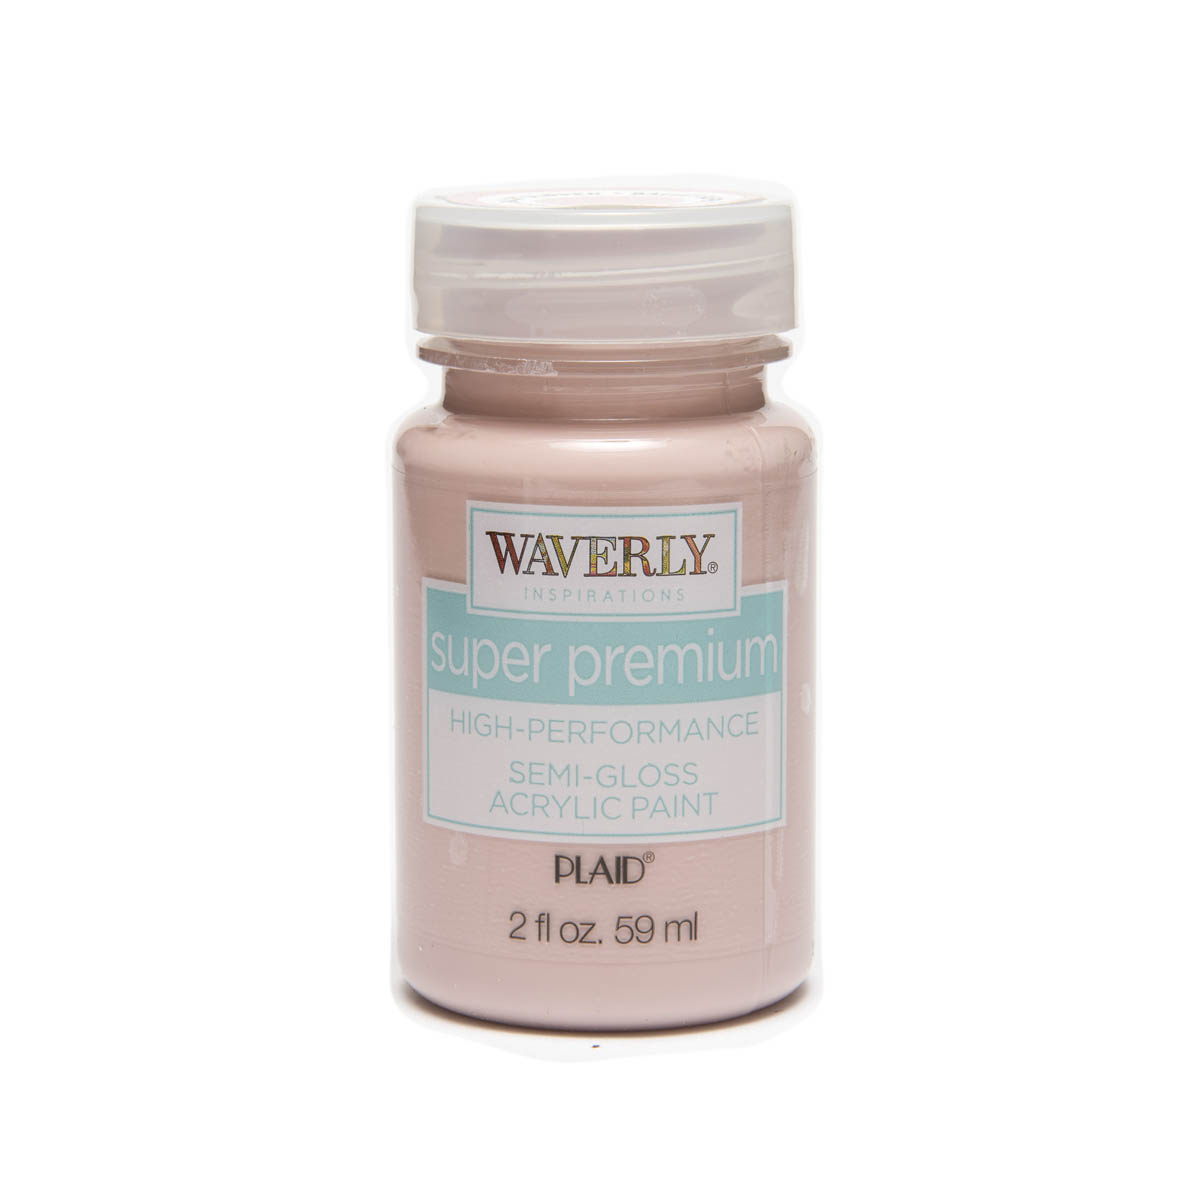 Waverly ® Inspirations Super Premium Semi-Gloss Acrylic Paint - Ballet Slipper, 2 oz. - 60604E